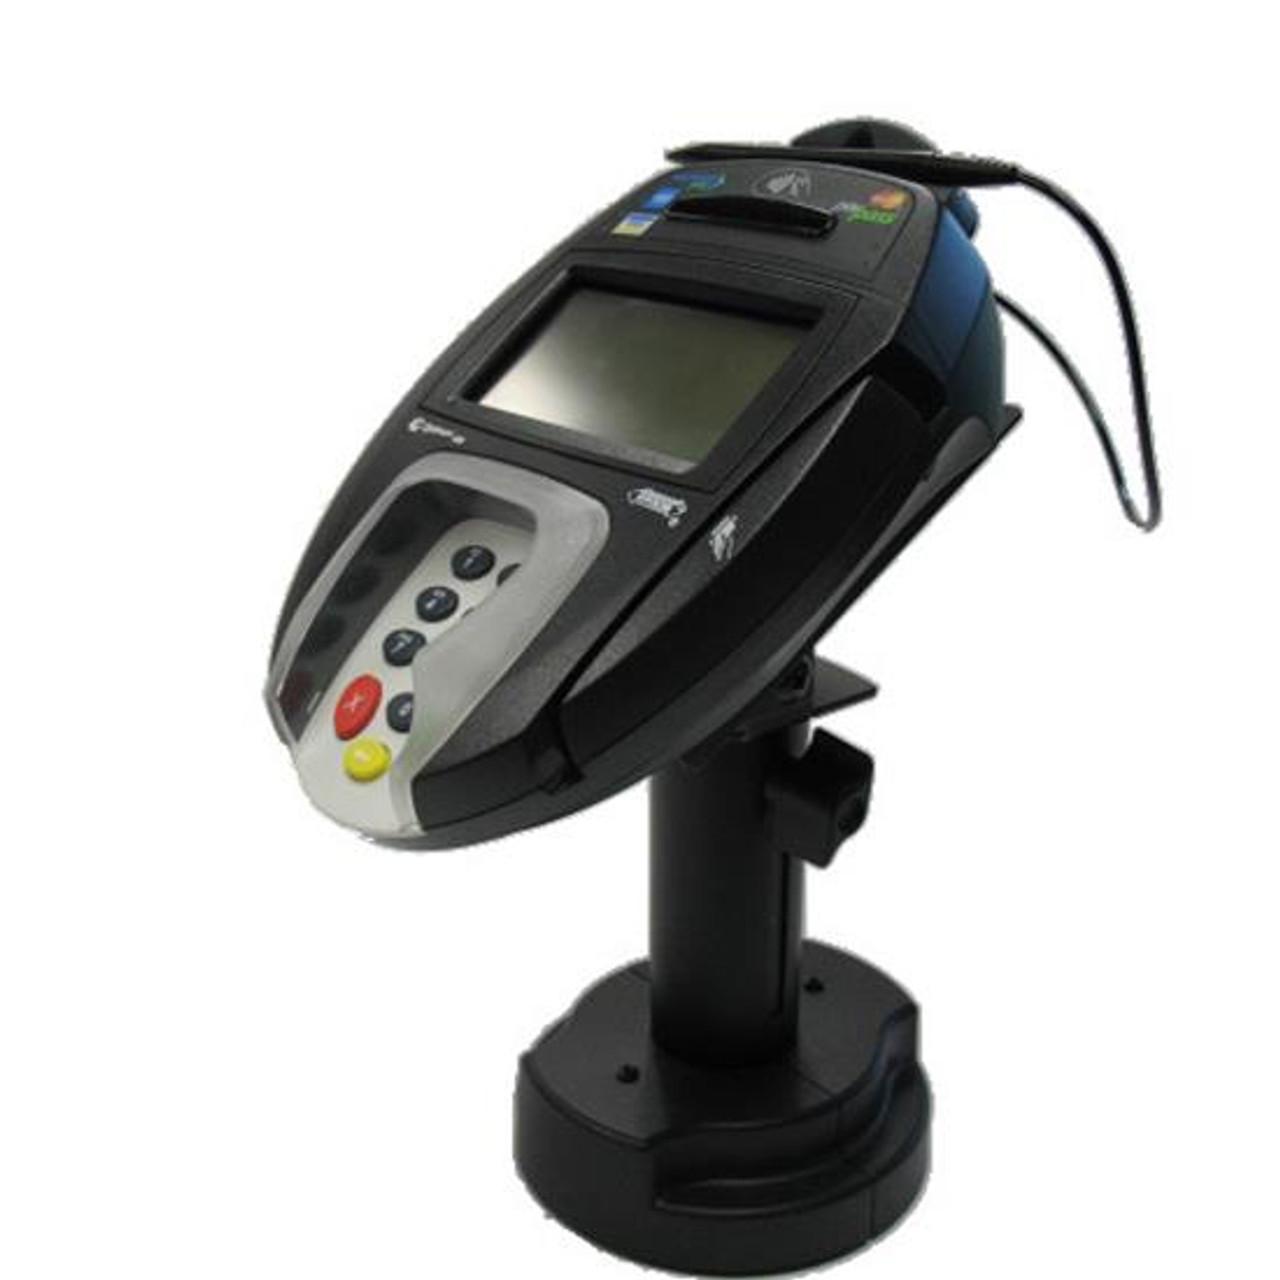 Swivel Stands Credit Card Stand Telescoping Pedestal Quick Release VeriFone MX860